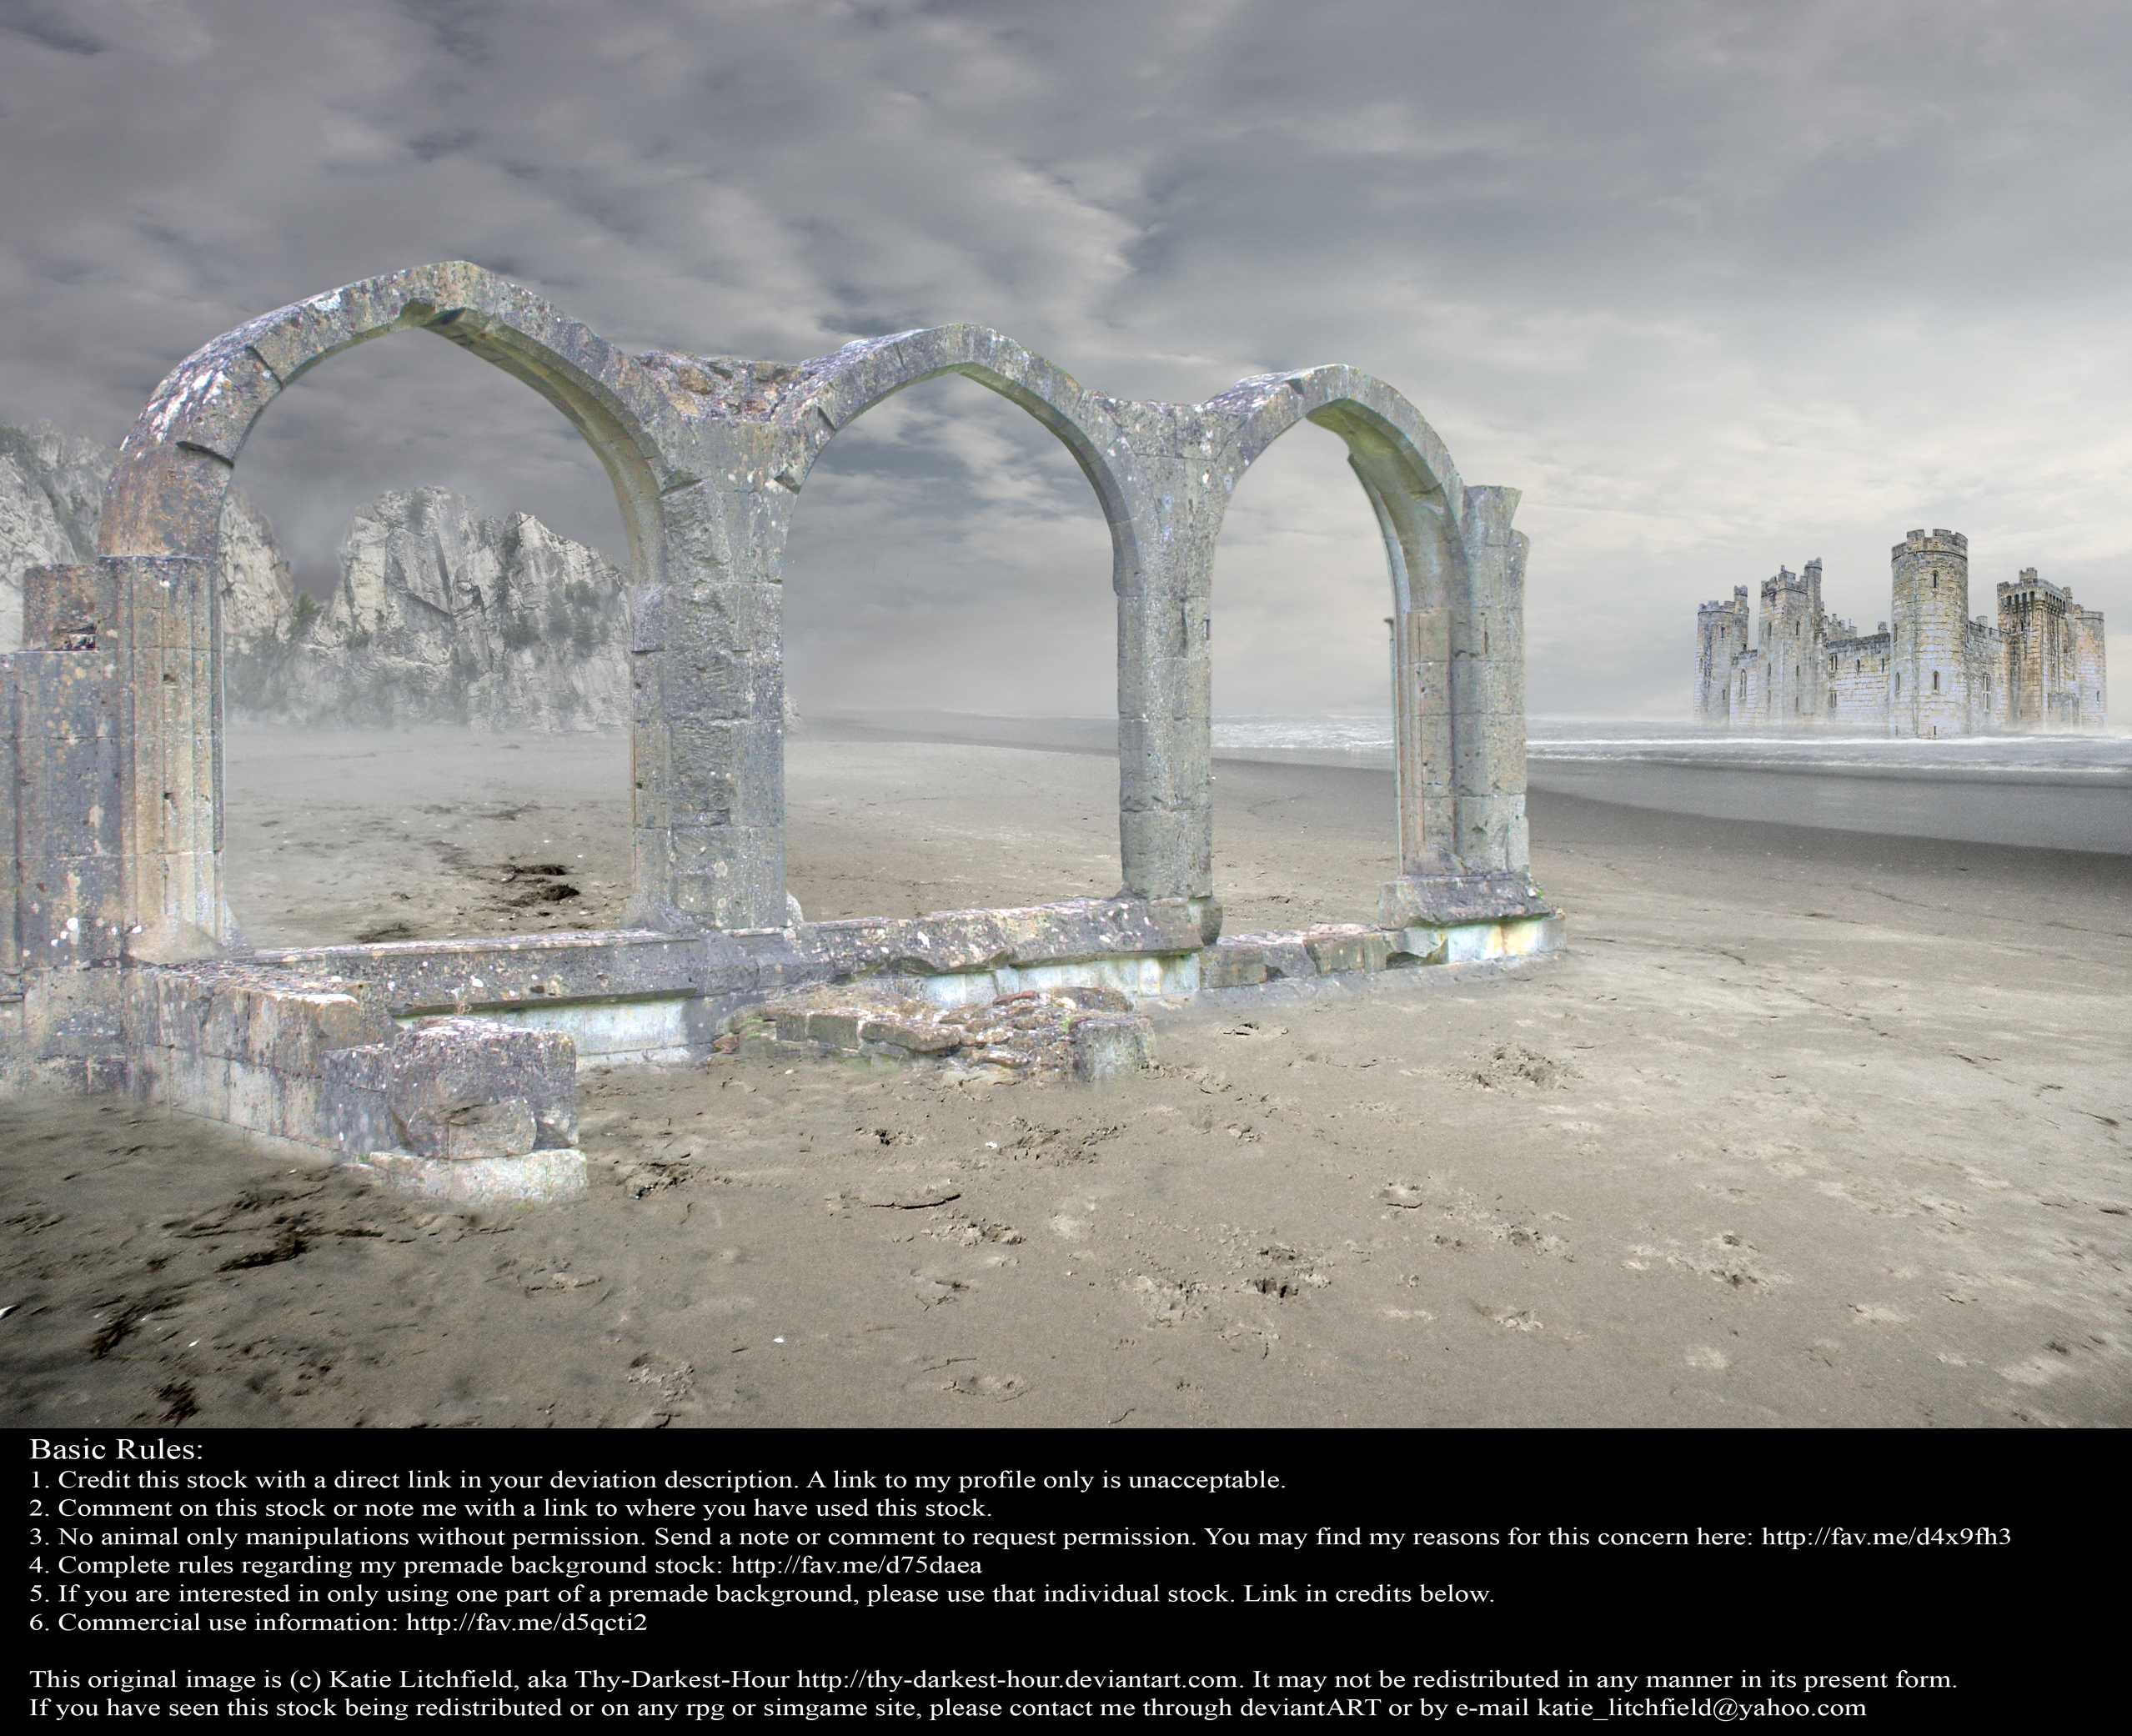 Ruins of Desolation 01 - Stock by Thy-Darkest-Hour